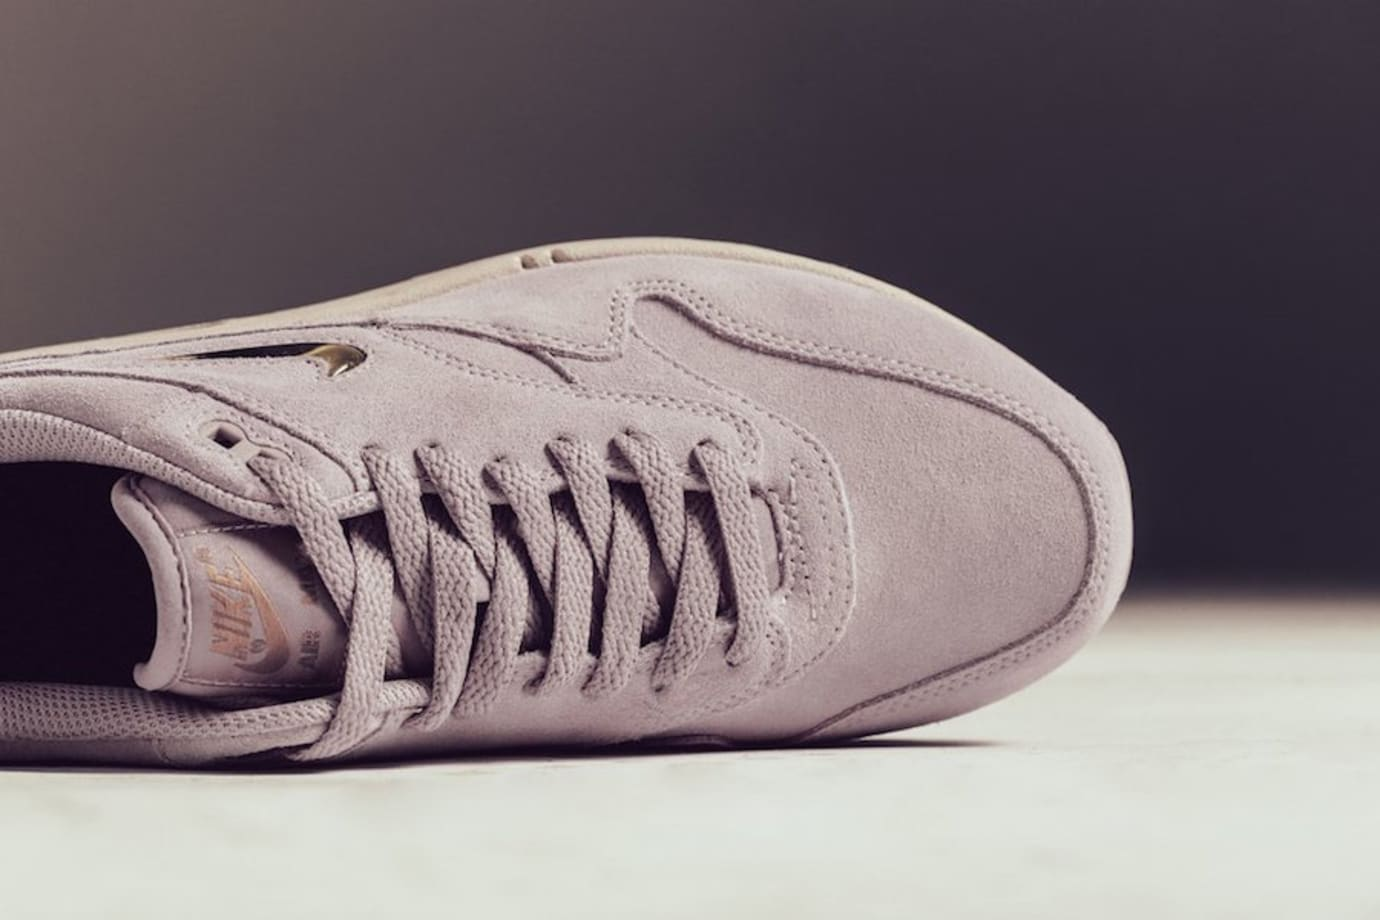 sale retailer 585c0 787c3 Image via Feature · Nike Air Max 1 Jewel Particle Rose 918354-601 (Toe)